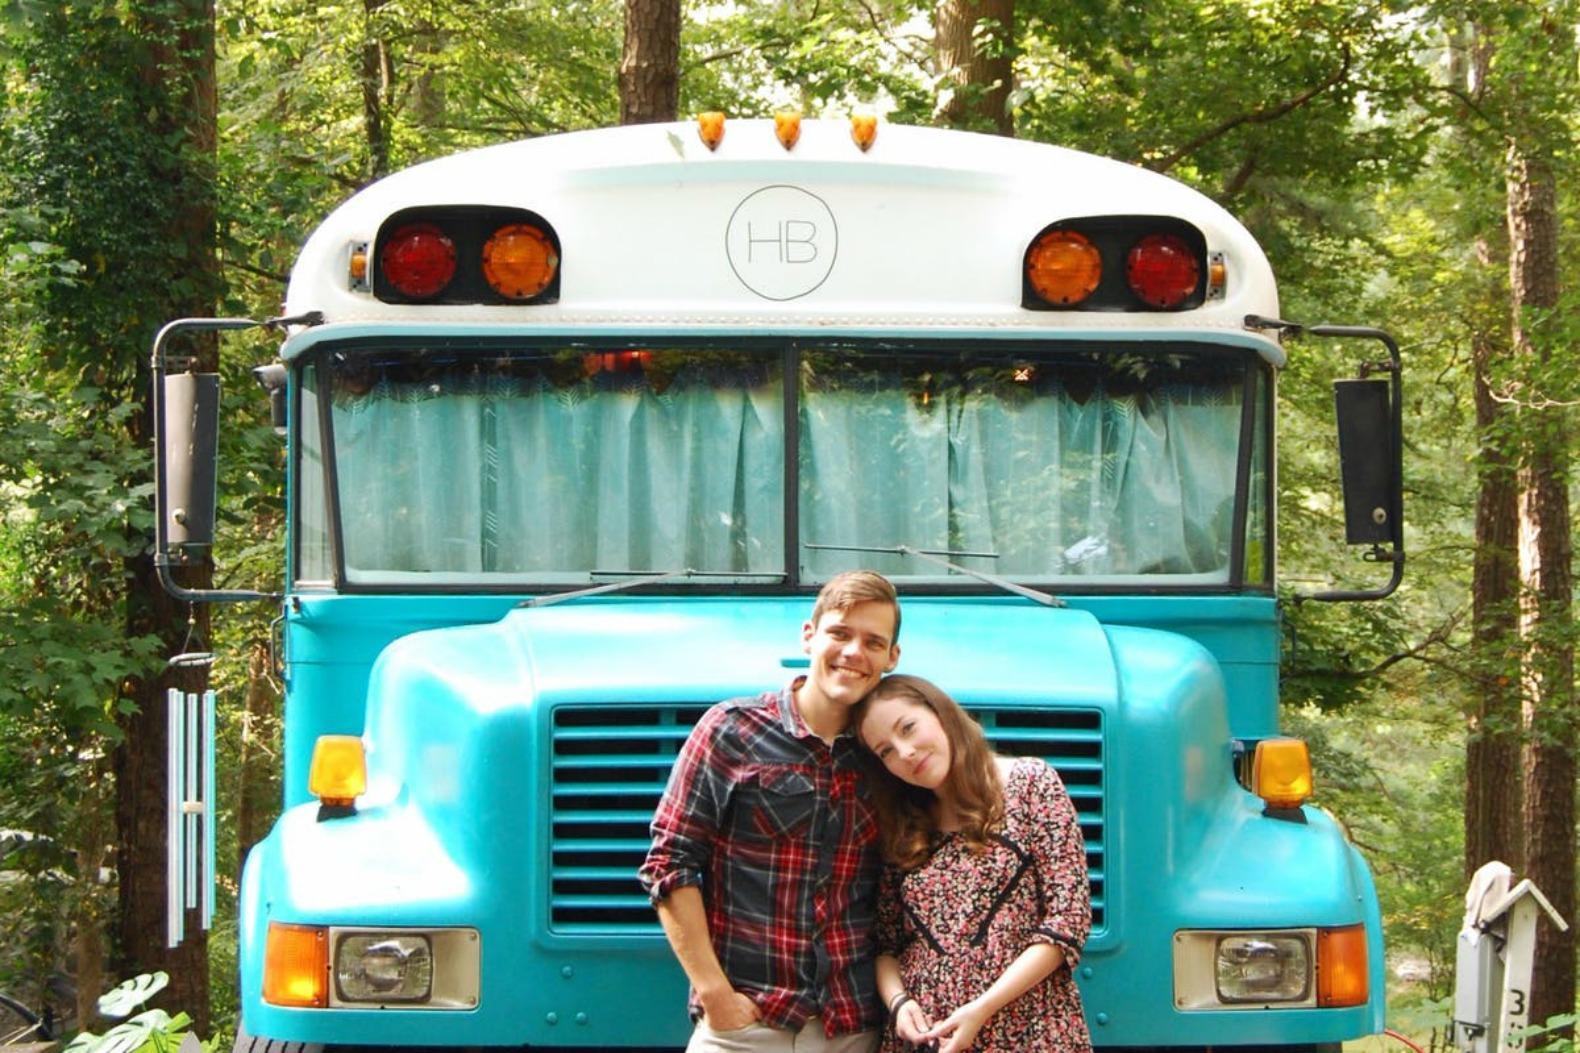 couplebusconversion-1494515164672.jpg